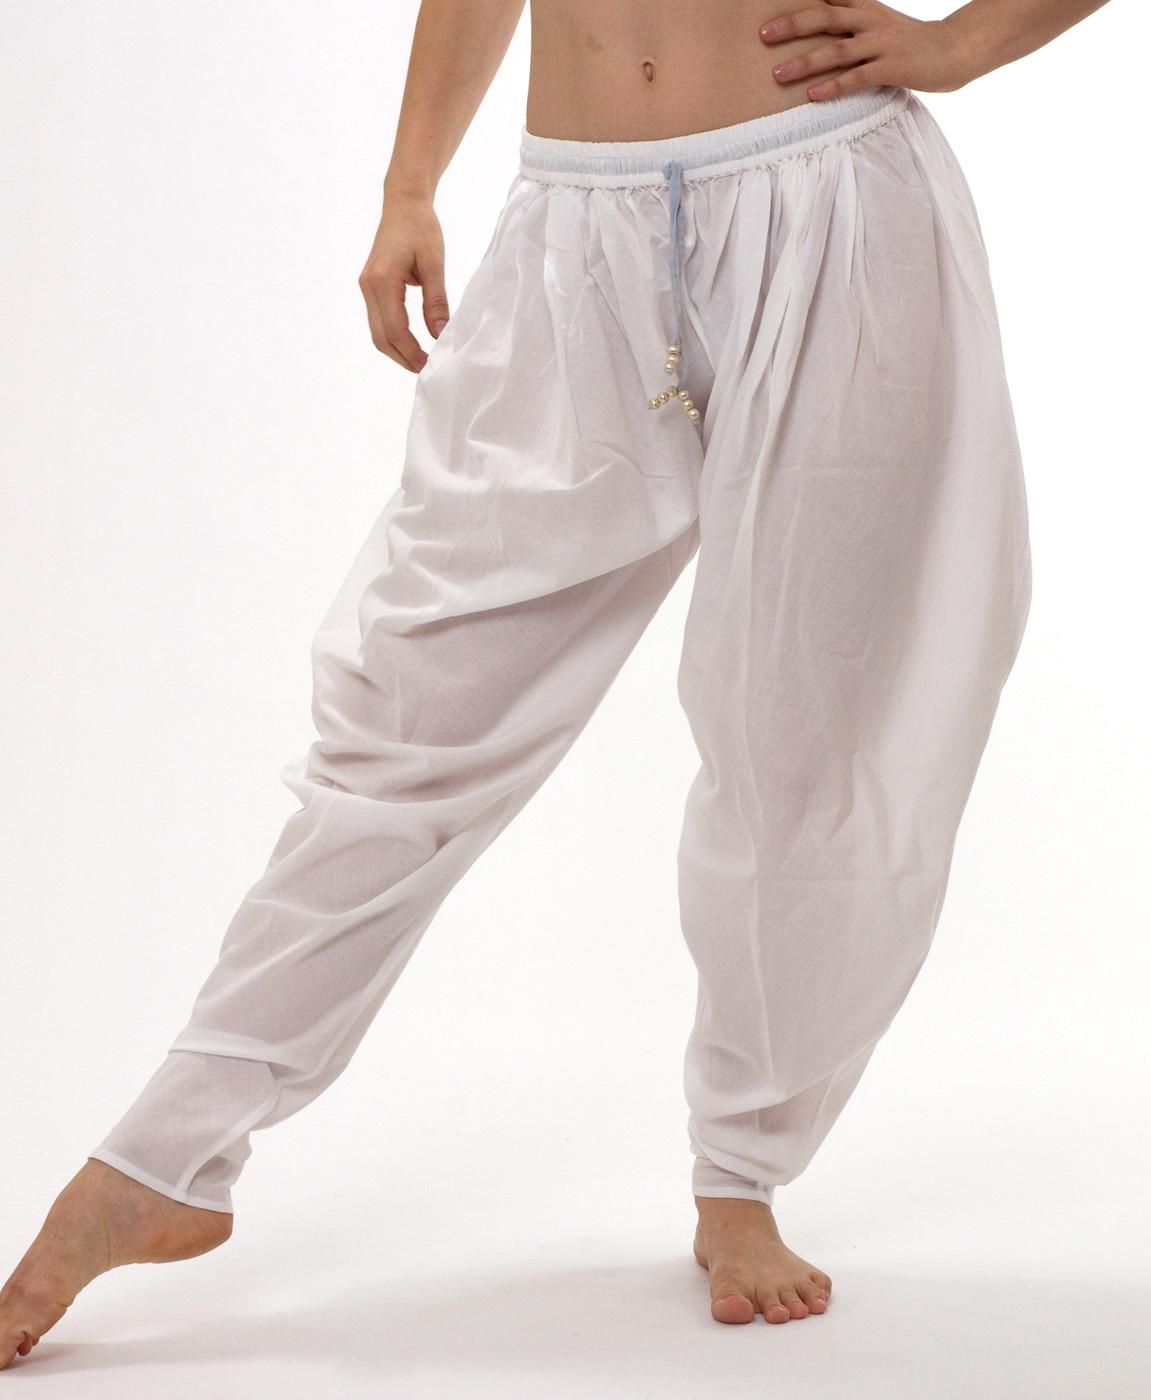 Baggy Churidaar yoga pant - white